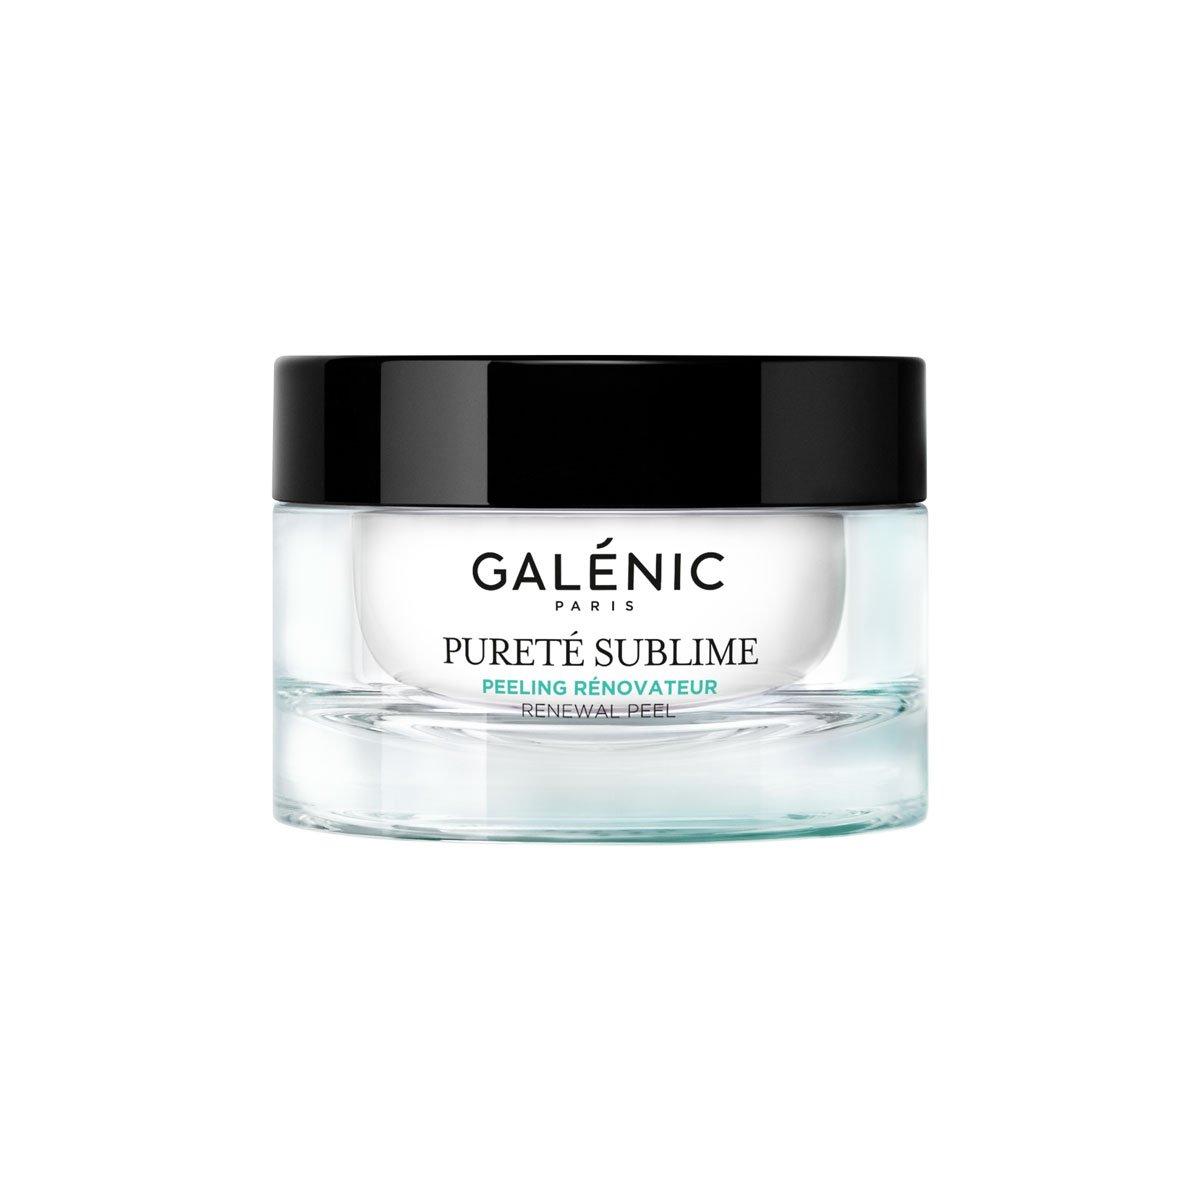 Galenic Purete Sublime Peeling Rinnovatore Viso 50 ml Galénic